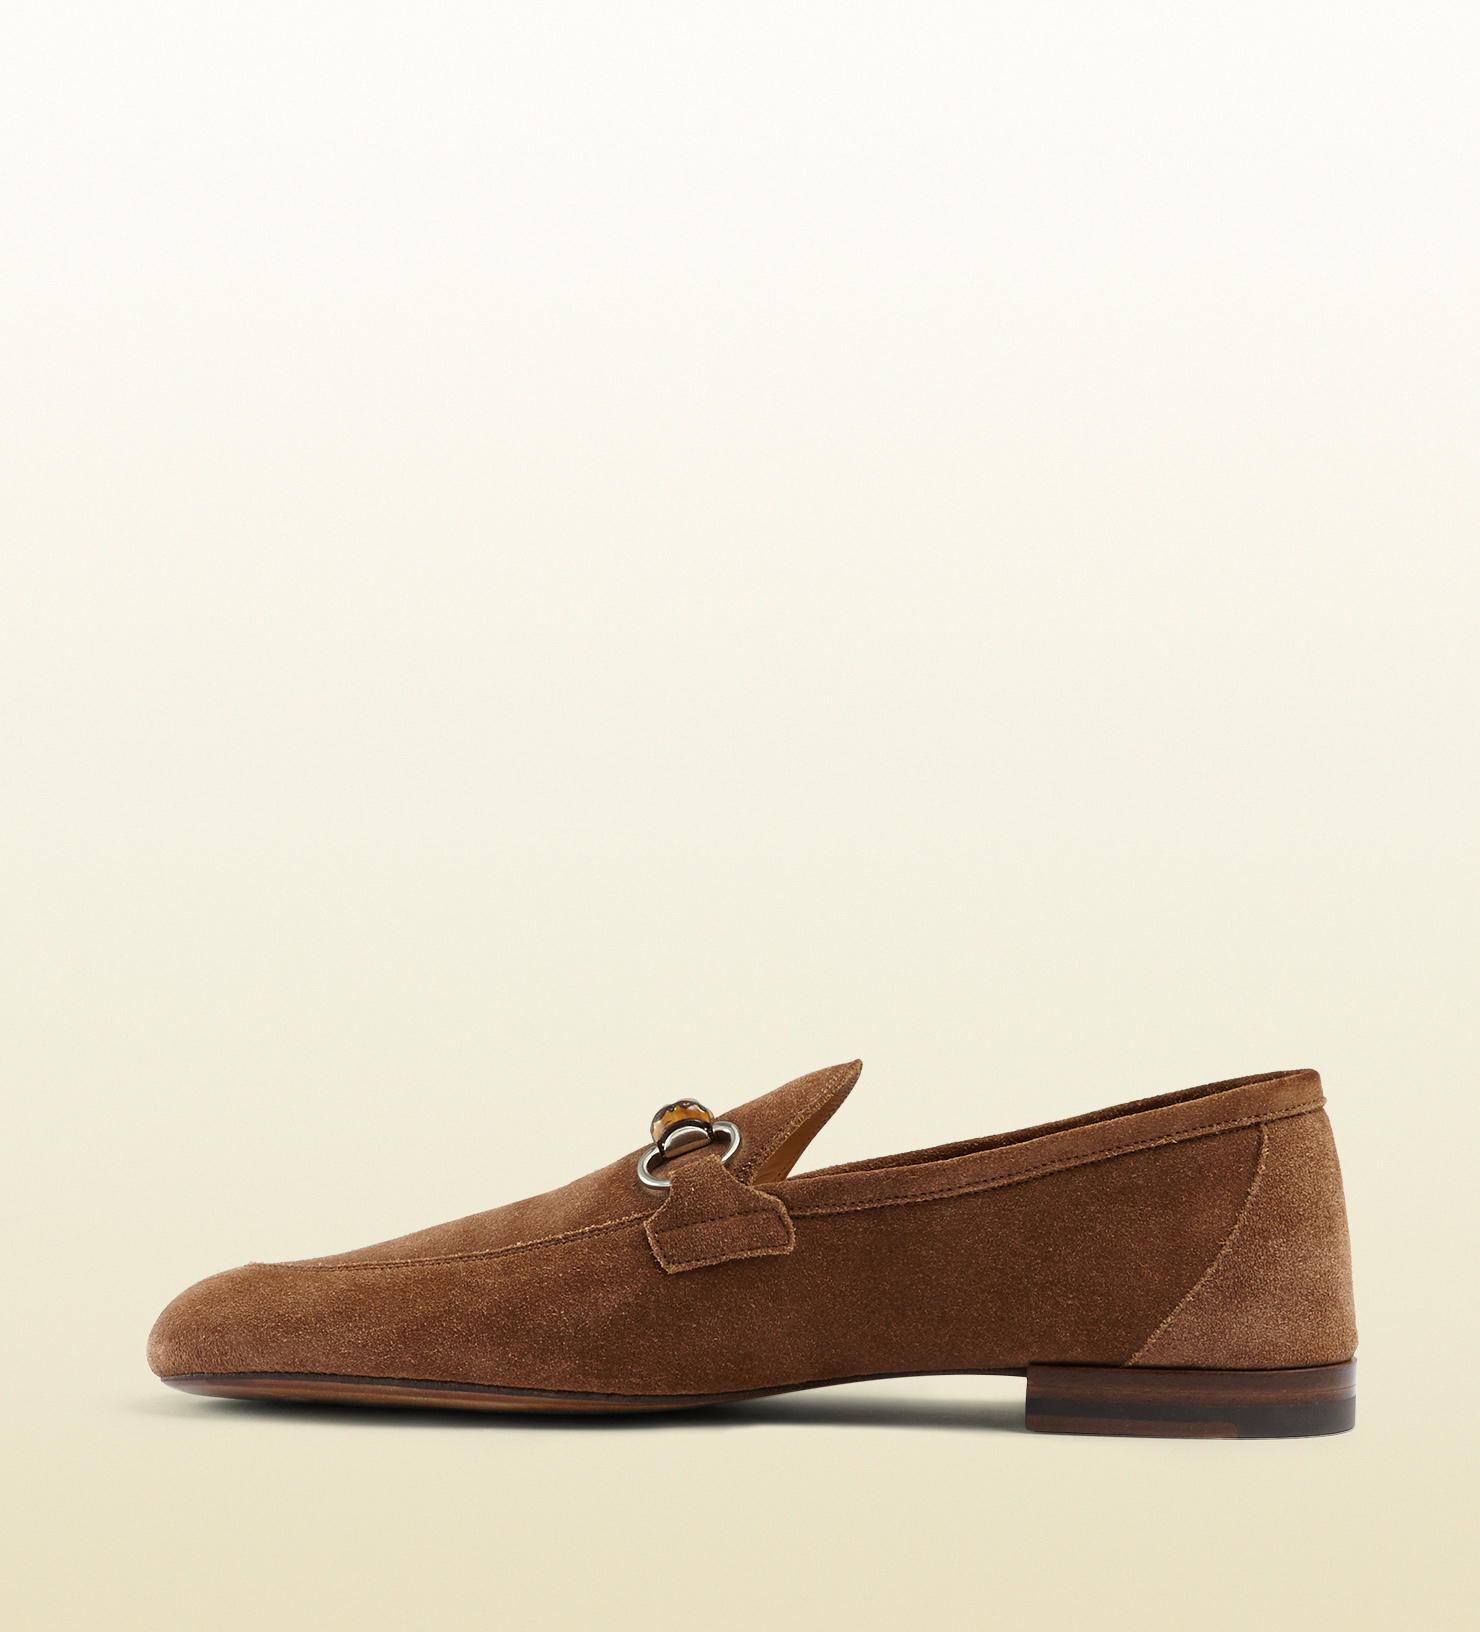 ca891bd8396 Gallery. Women s Crocs Santa Cruz Men s Slip On Loafers Men s Gucci ...